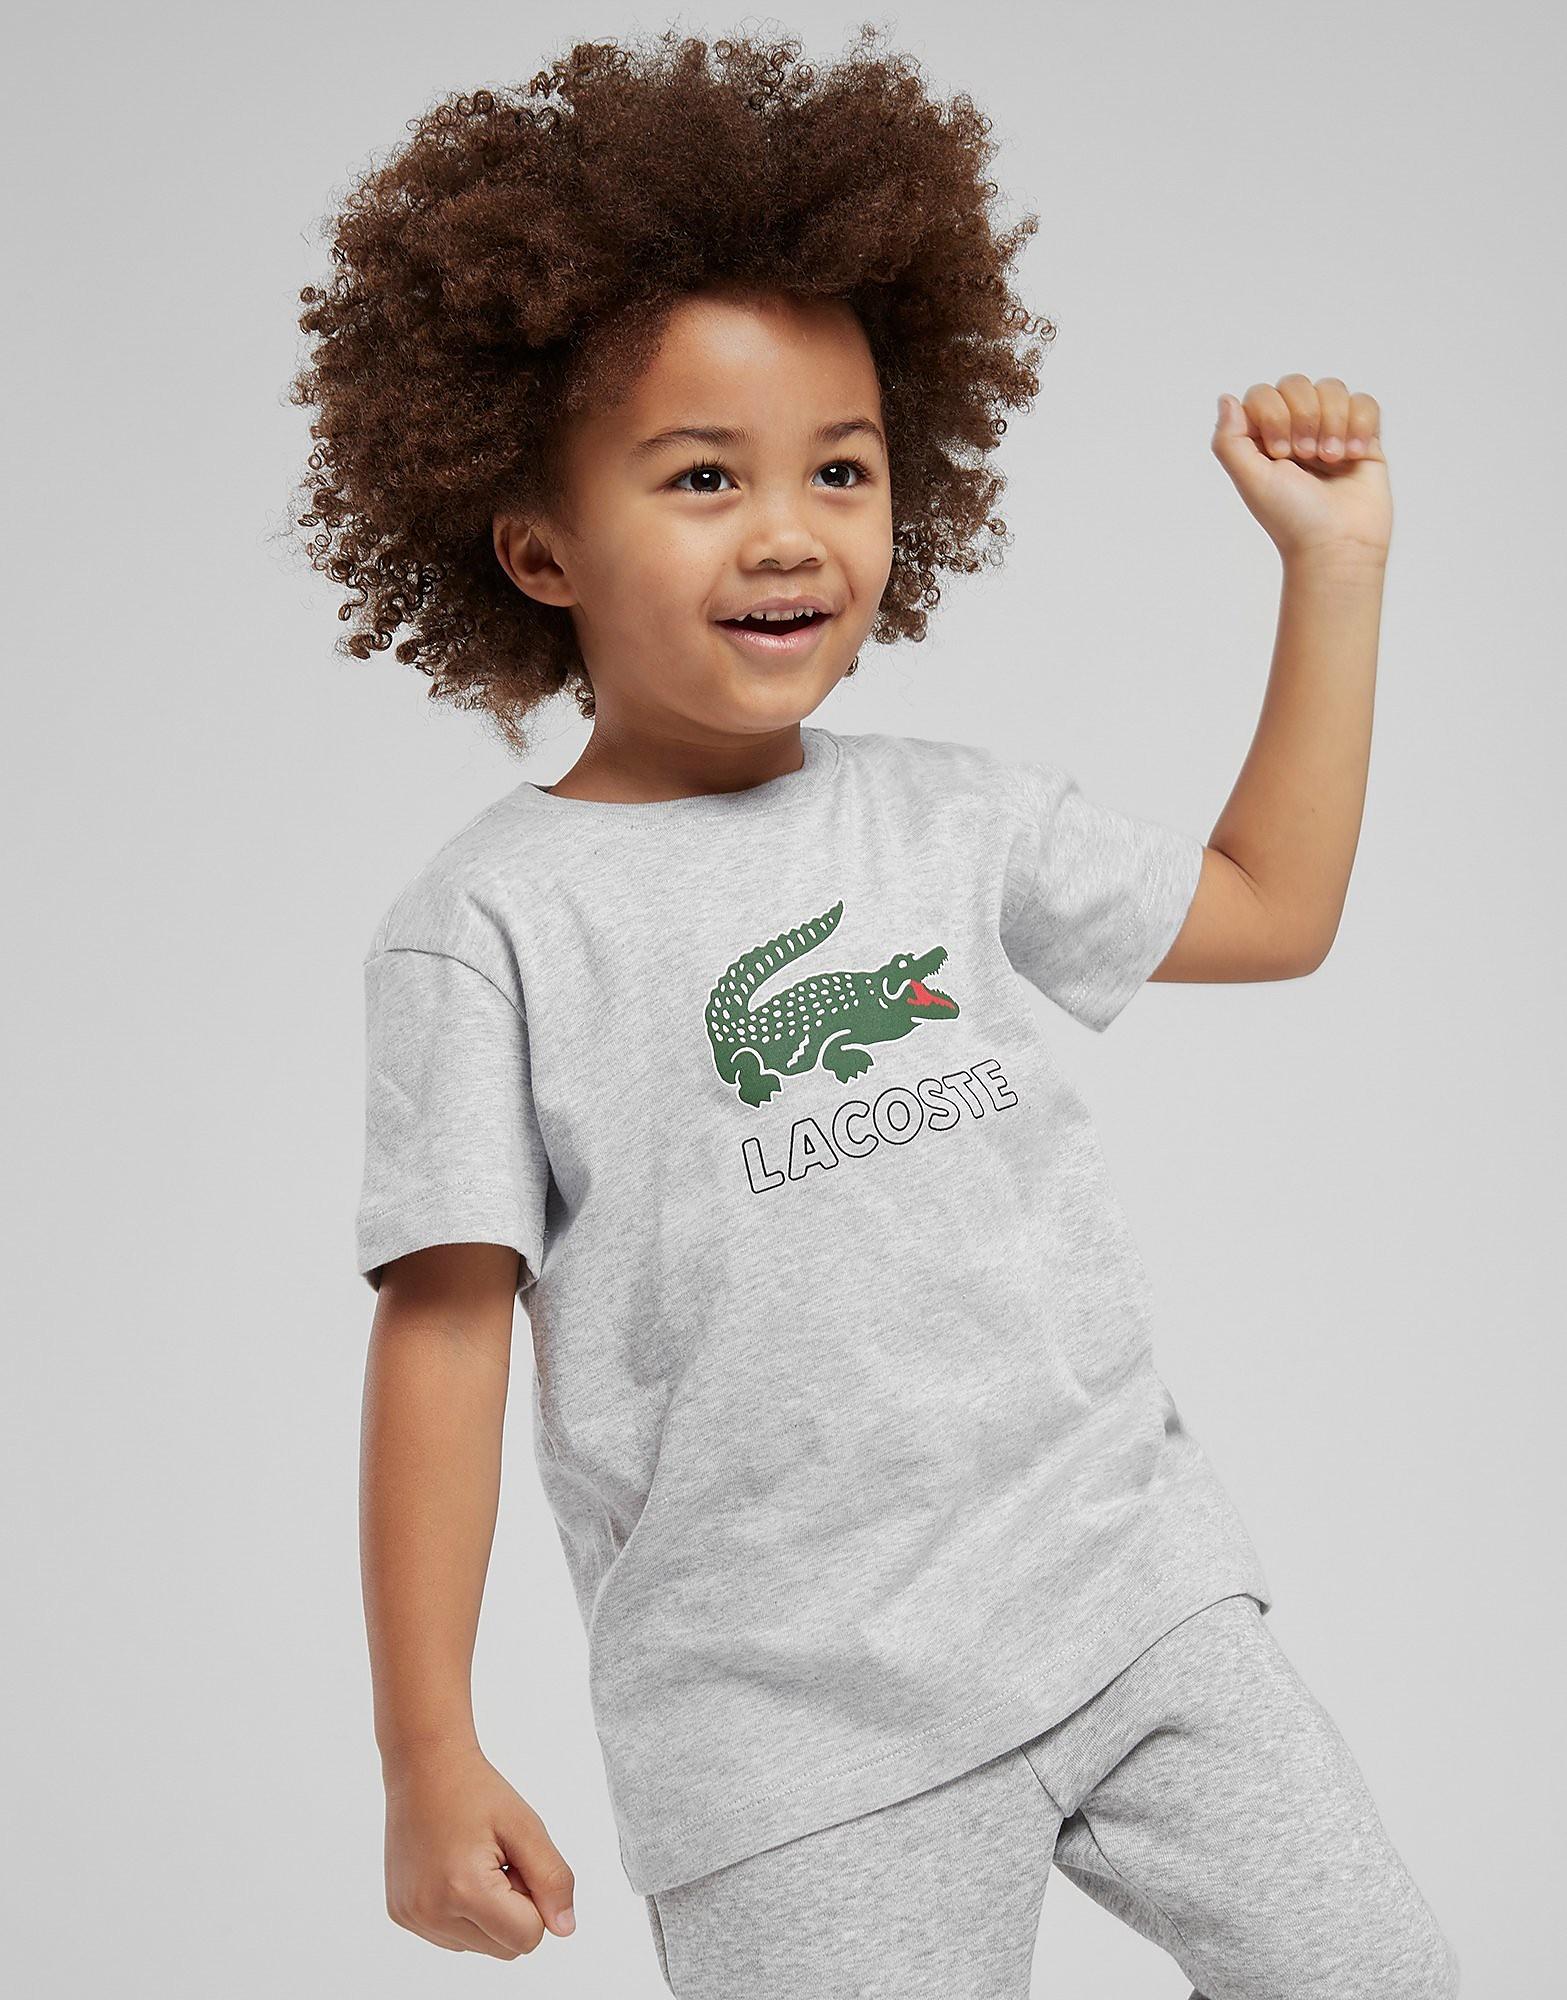 Lacoste Vintage Croc T-Shirt Kinderen - Grijs - Kind